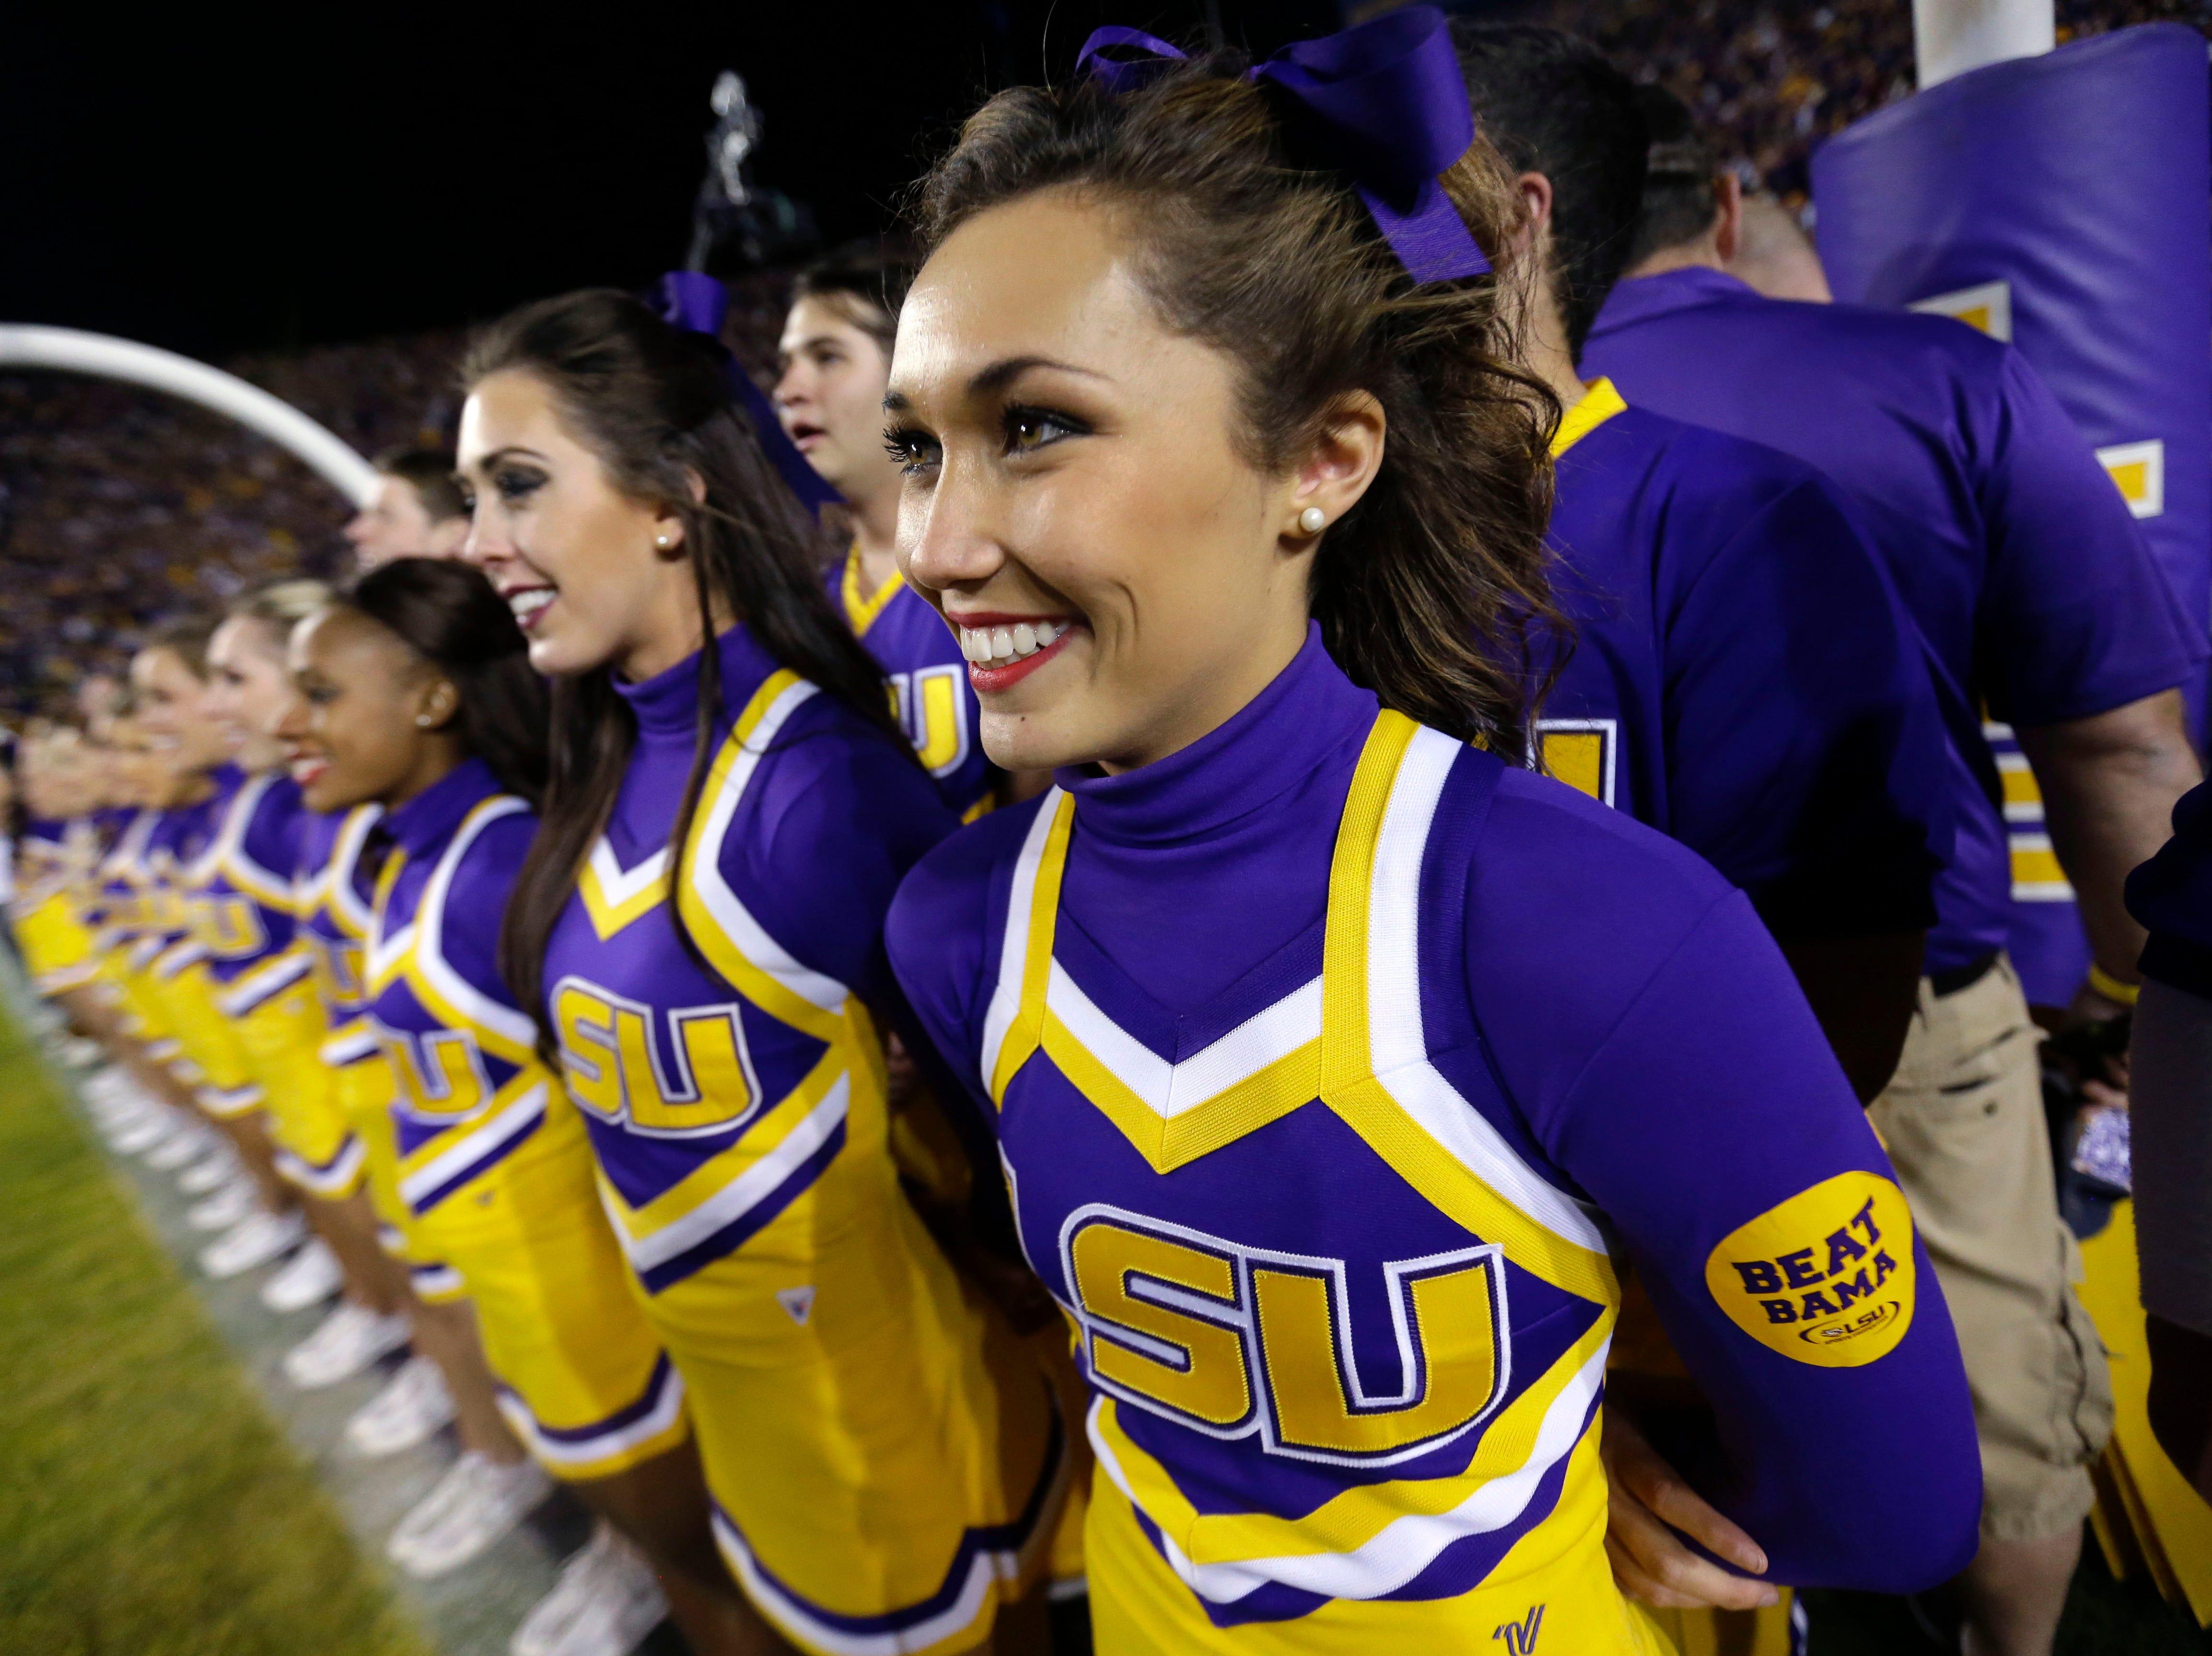 LSU cheerleaders sing the school anthem before an NCAA college football game against Alabama in Baton Rouge, La., Saturday, Nov. 8, 2014. Alabama won in overtime 20-13. (AP Photo/Gerald Herbert)